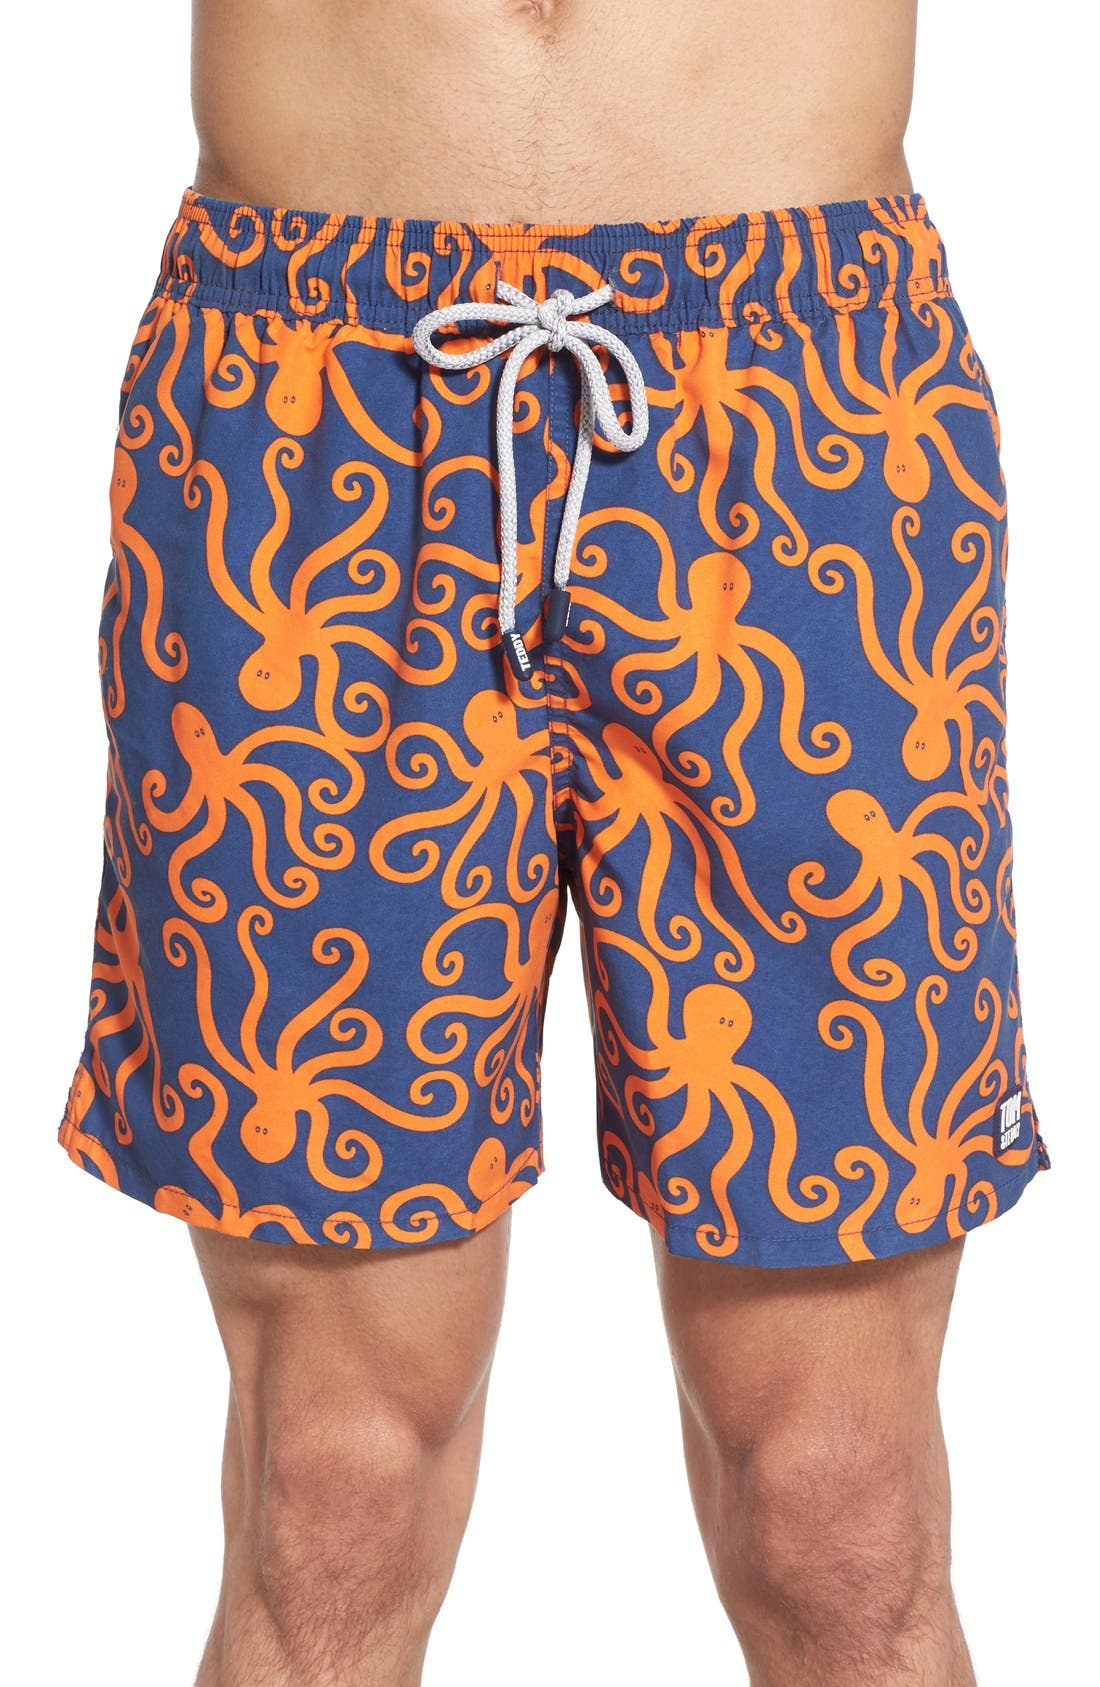 'Octopus Pattern' Swim Trunks,                             Main thumbnail 1, color,                             BLUE/ ORANGE